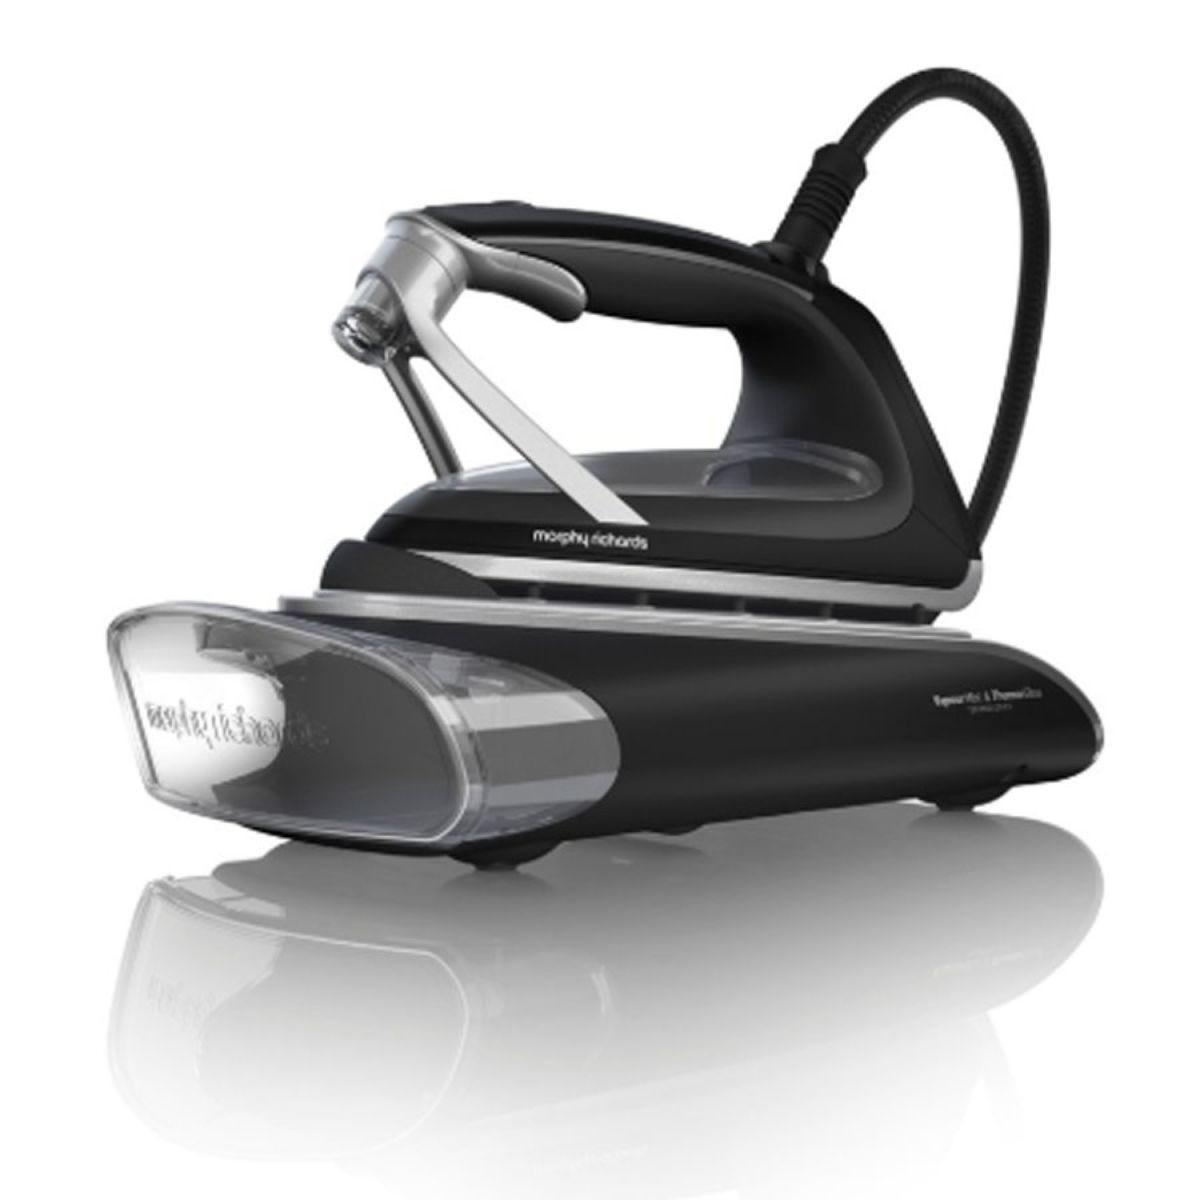 Morphy Richards Redefine ATOMist Vapour Iron - Black